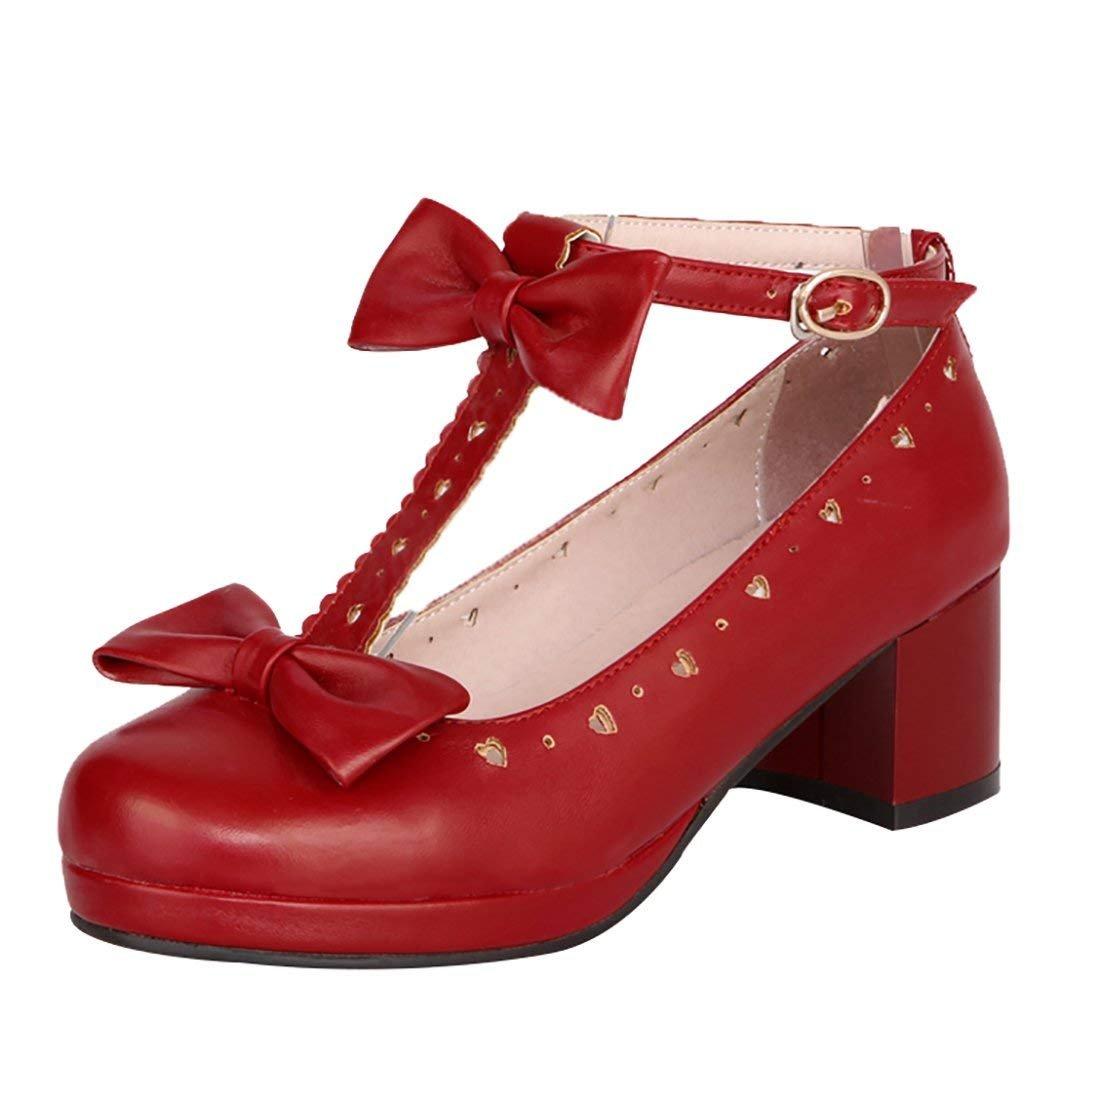 YE Escarpin Femme Rockabilly Femme B01N4HMCRY Chaussure Talon Bloc Lanière en T Boucle Chaussure Noeud Pallion Rouge 5171be0 - therethere.space